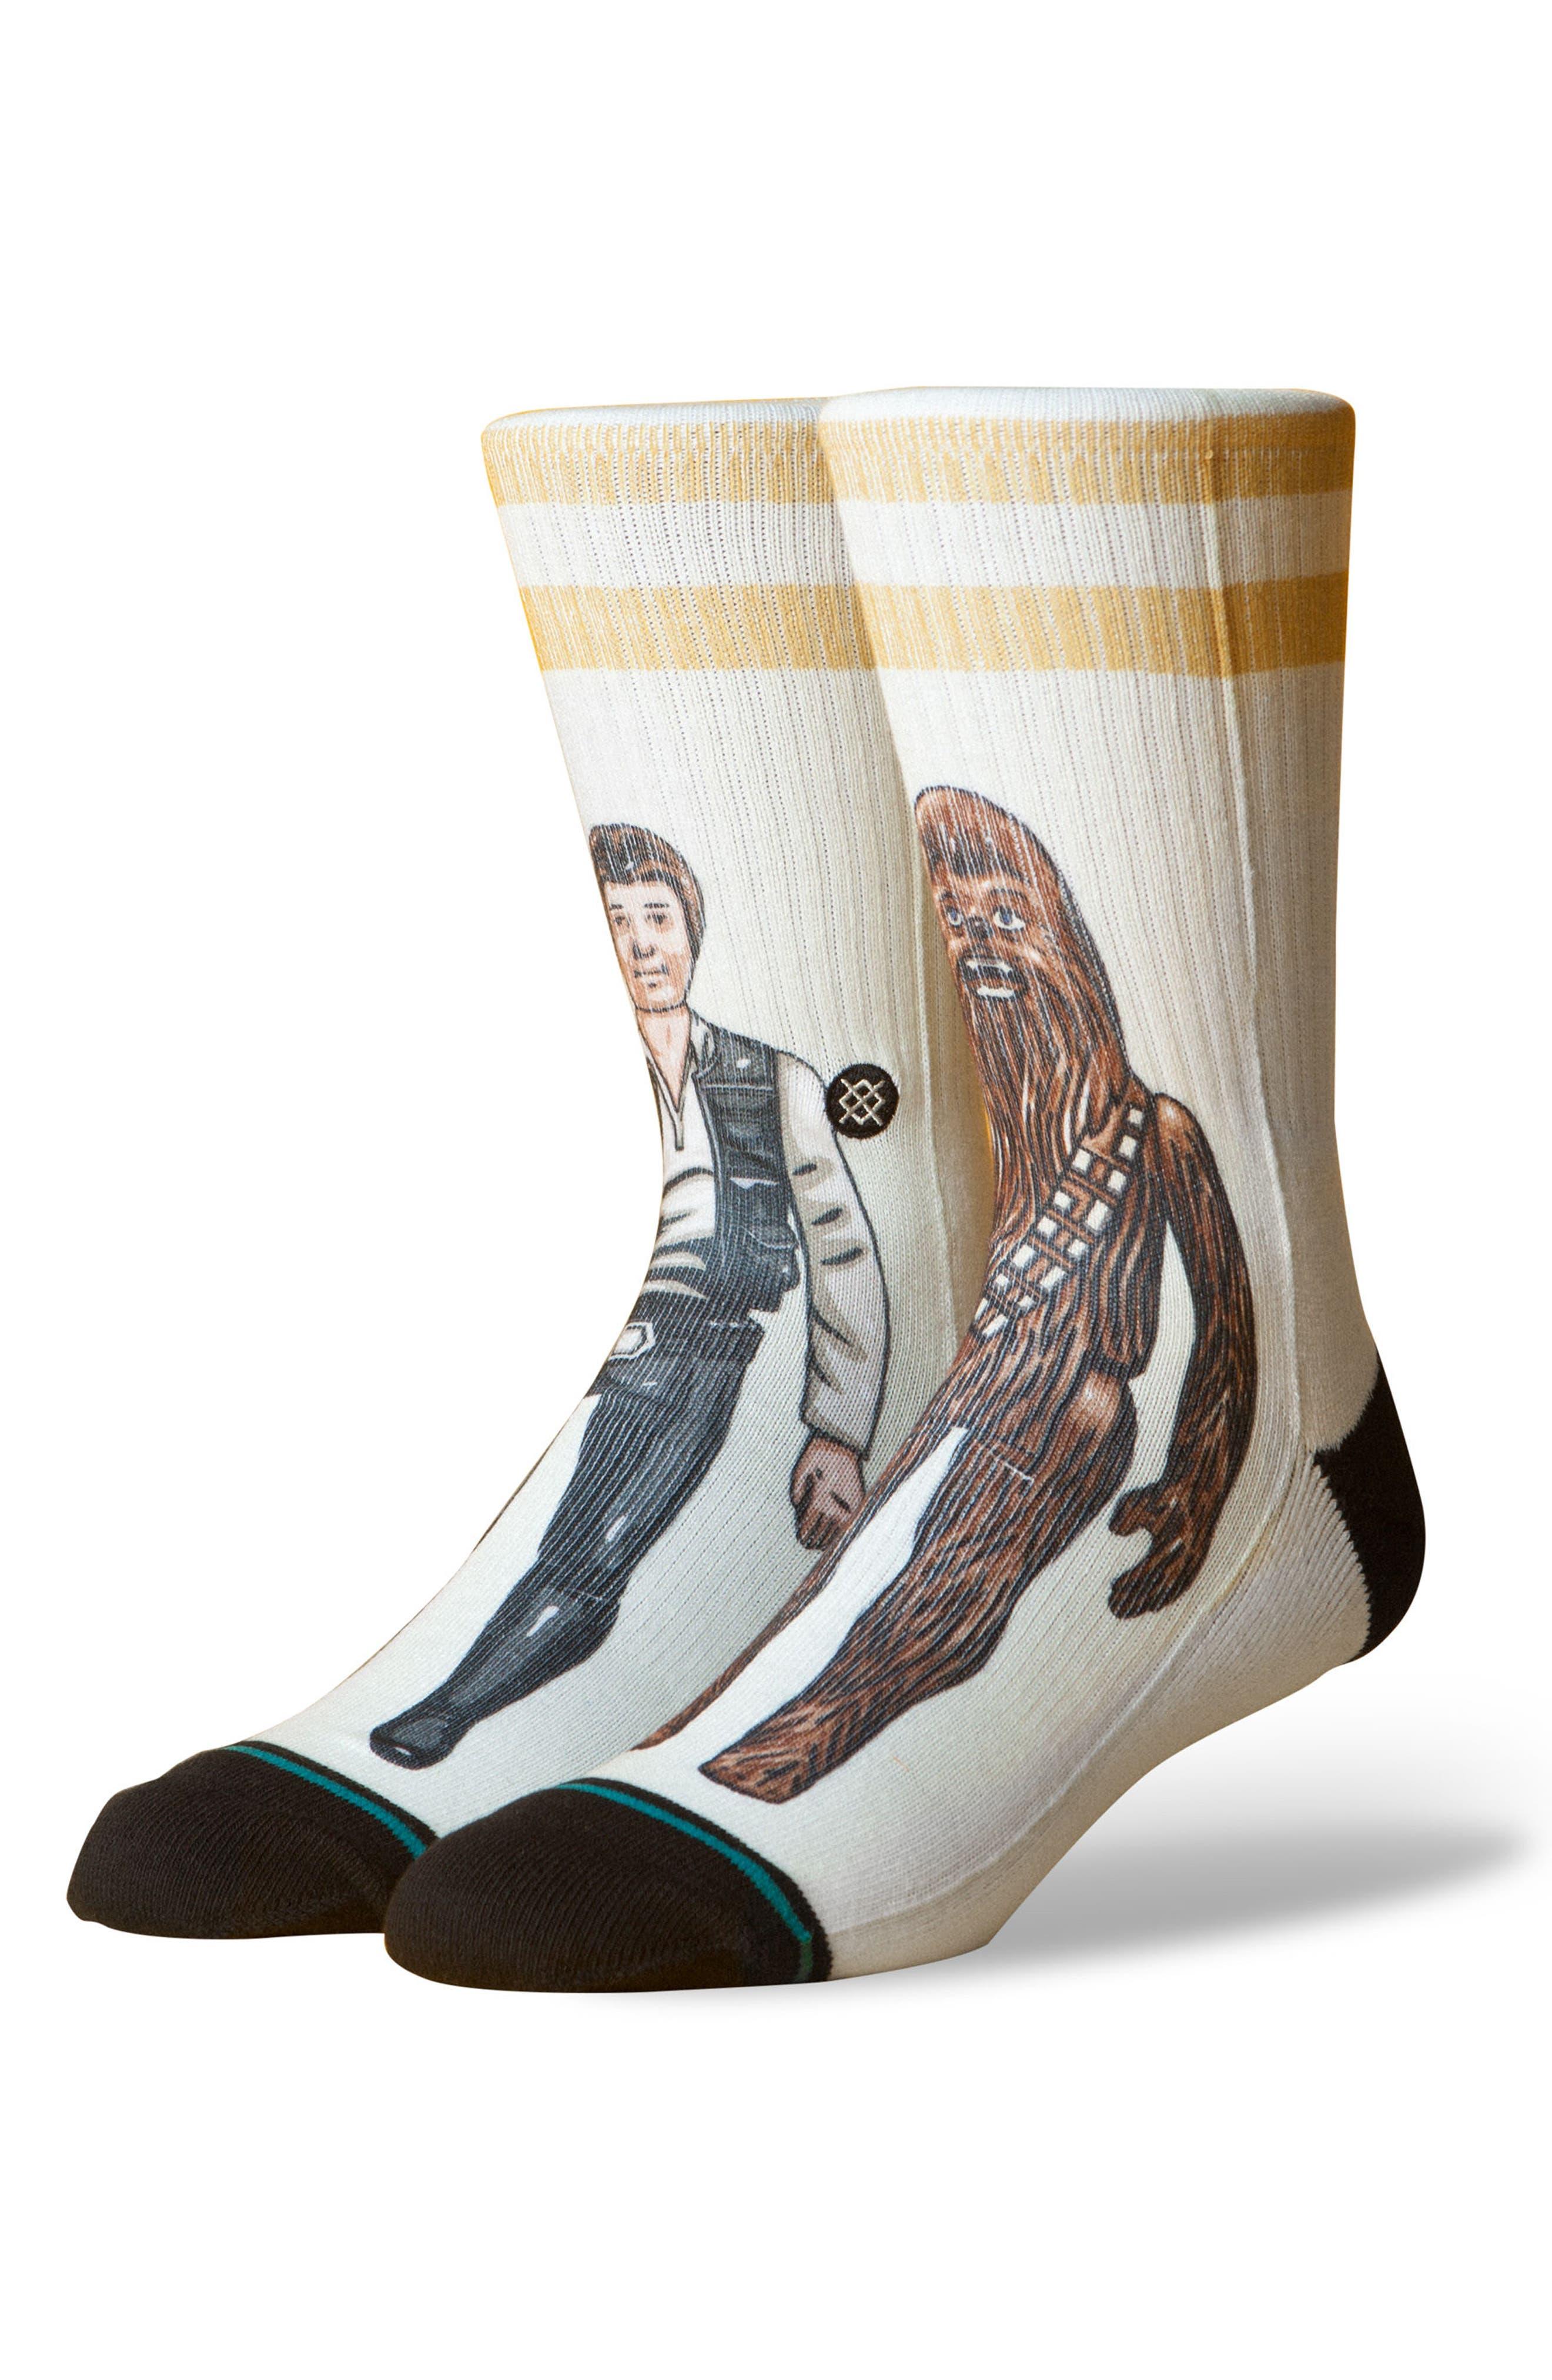 Star Wars<sup>™</sup> Smuggler Trade Socks,                         Main,                         color, Off White